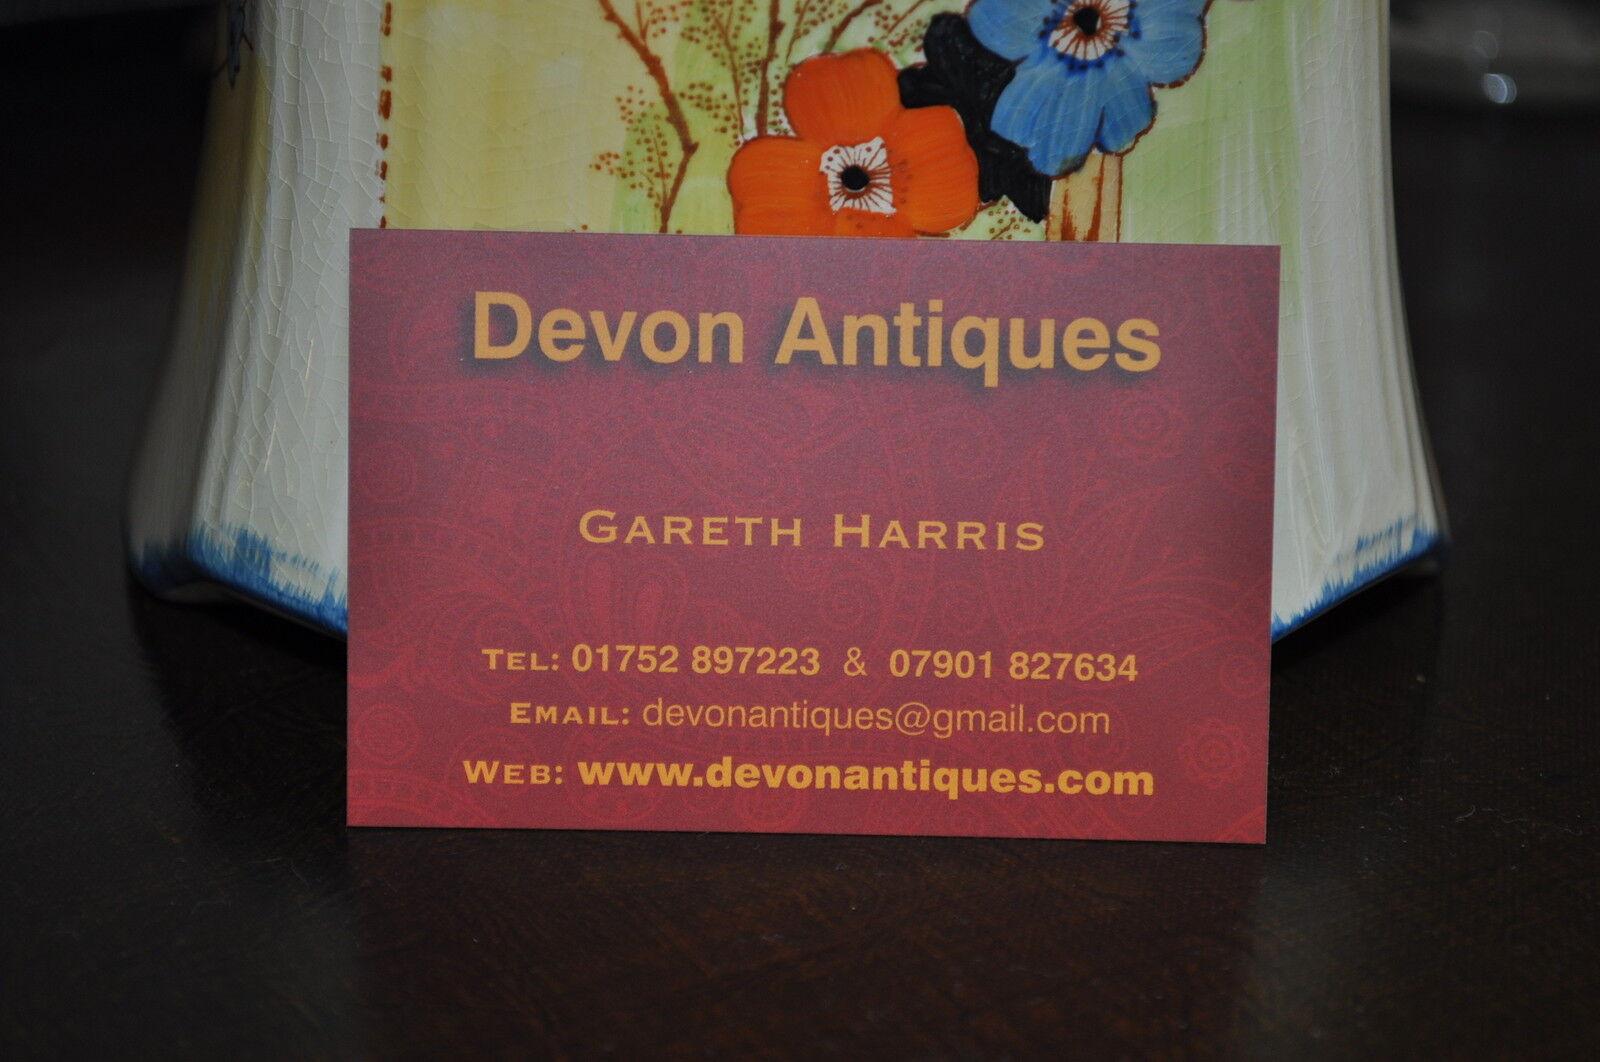 Devon Antiques